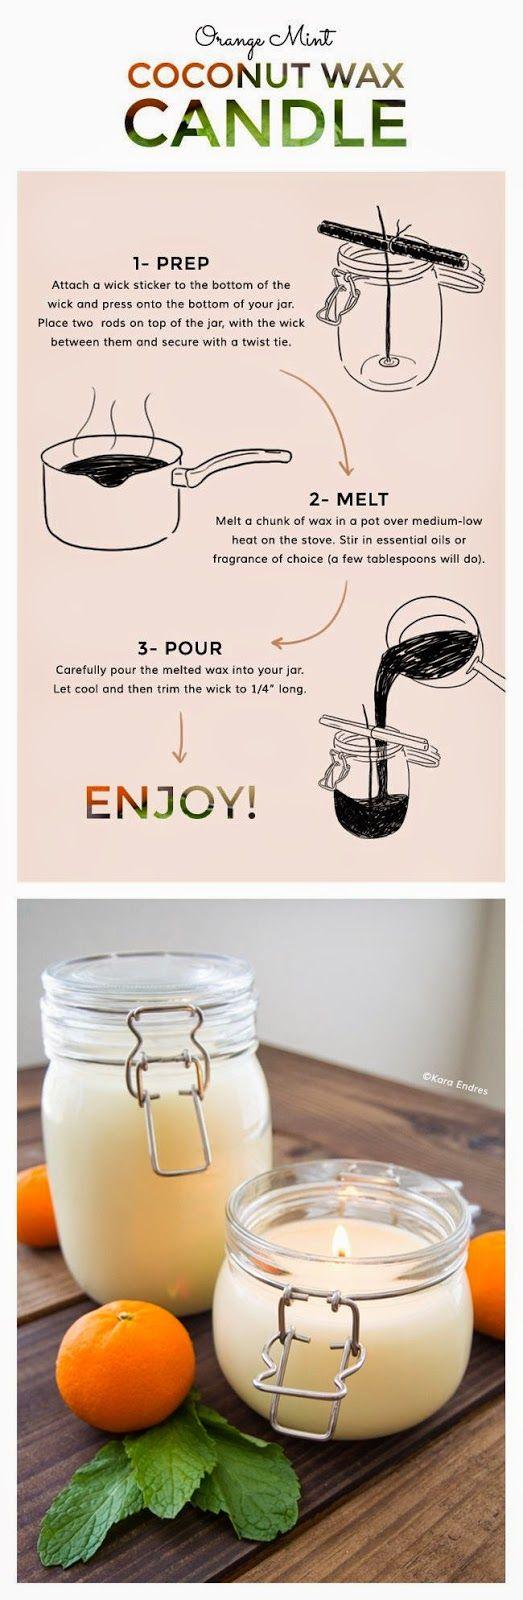 DIY: orange mint coconut wax candle